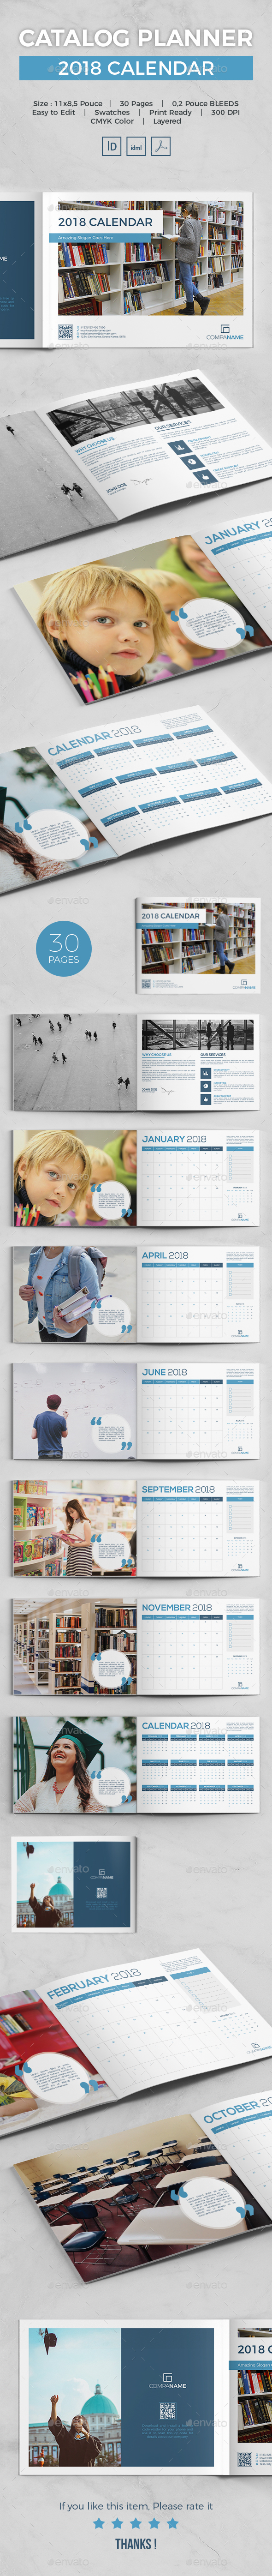 Catalog Planner 2018 Calendar - Catalogs Brochures